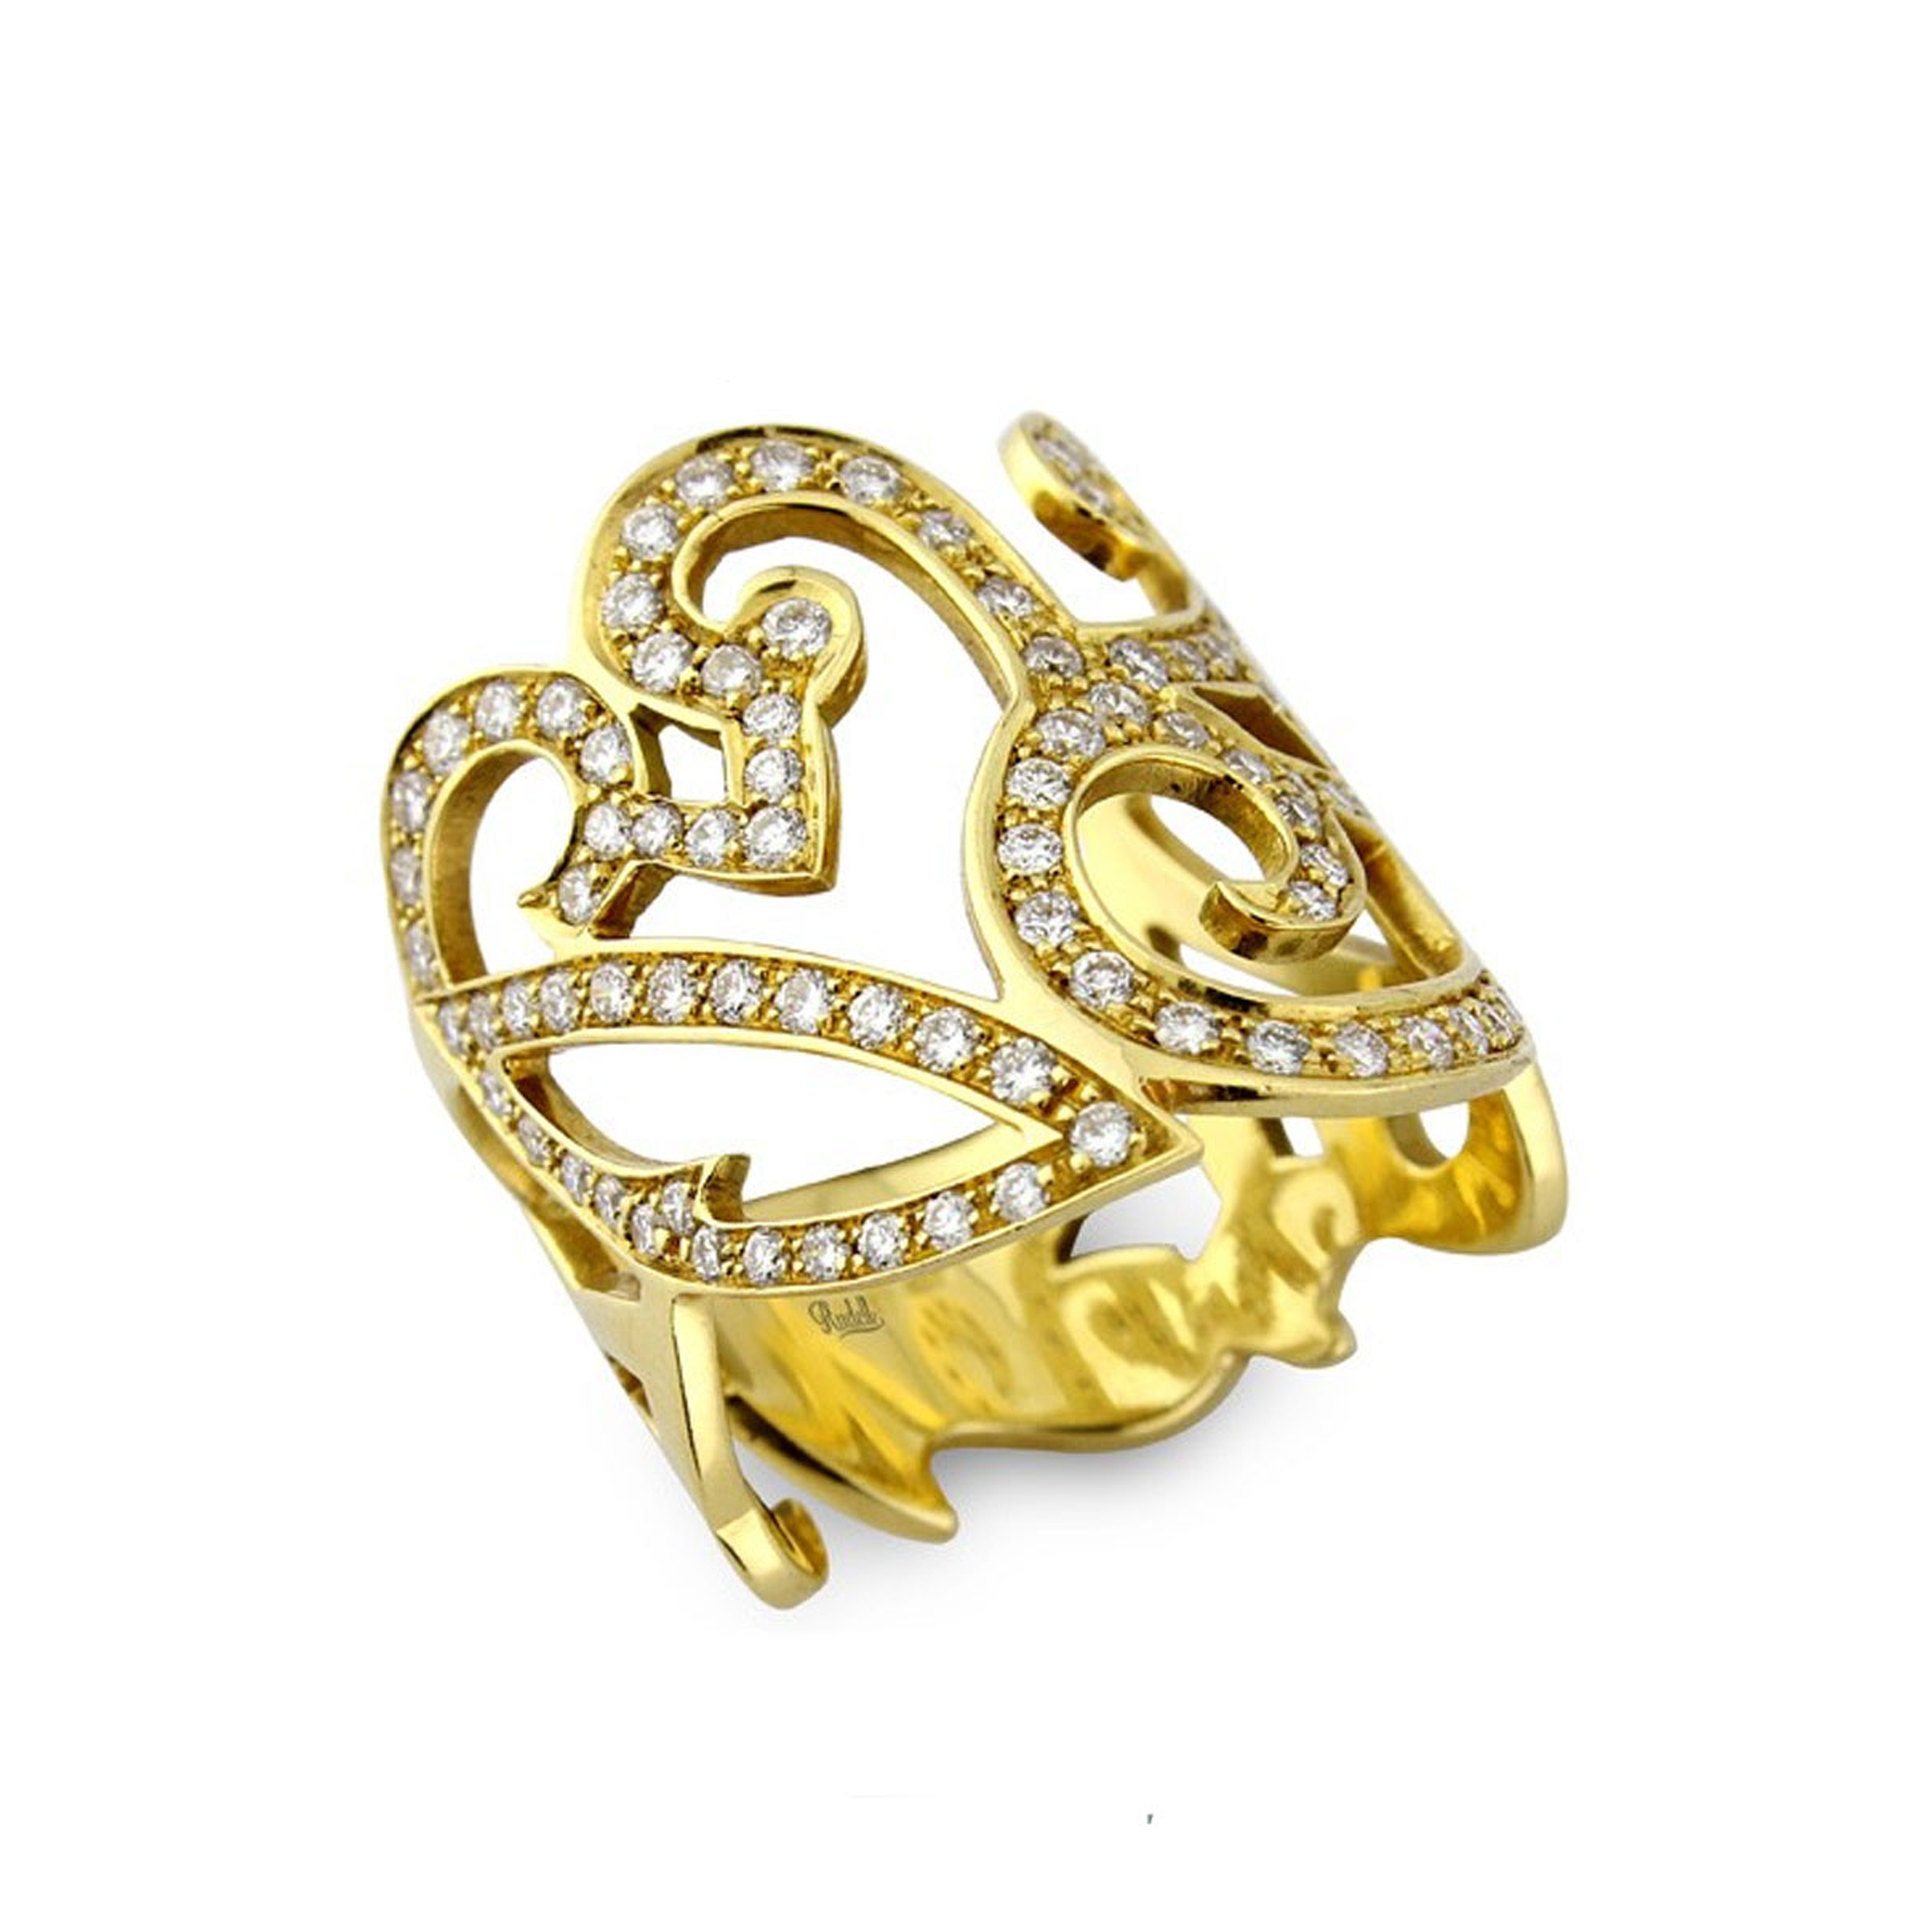 18ct Yellow Gold Wide Ornate Swirl Diamond Ring